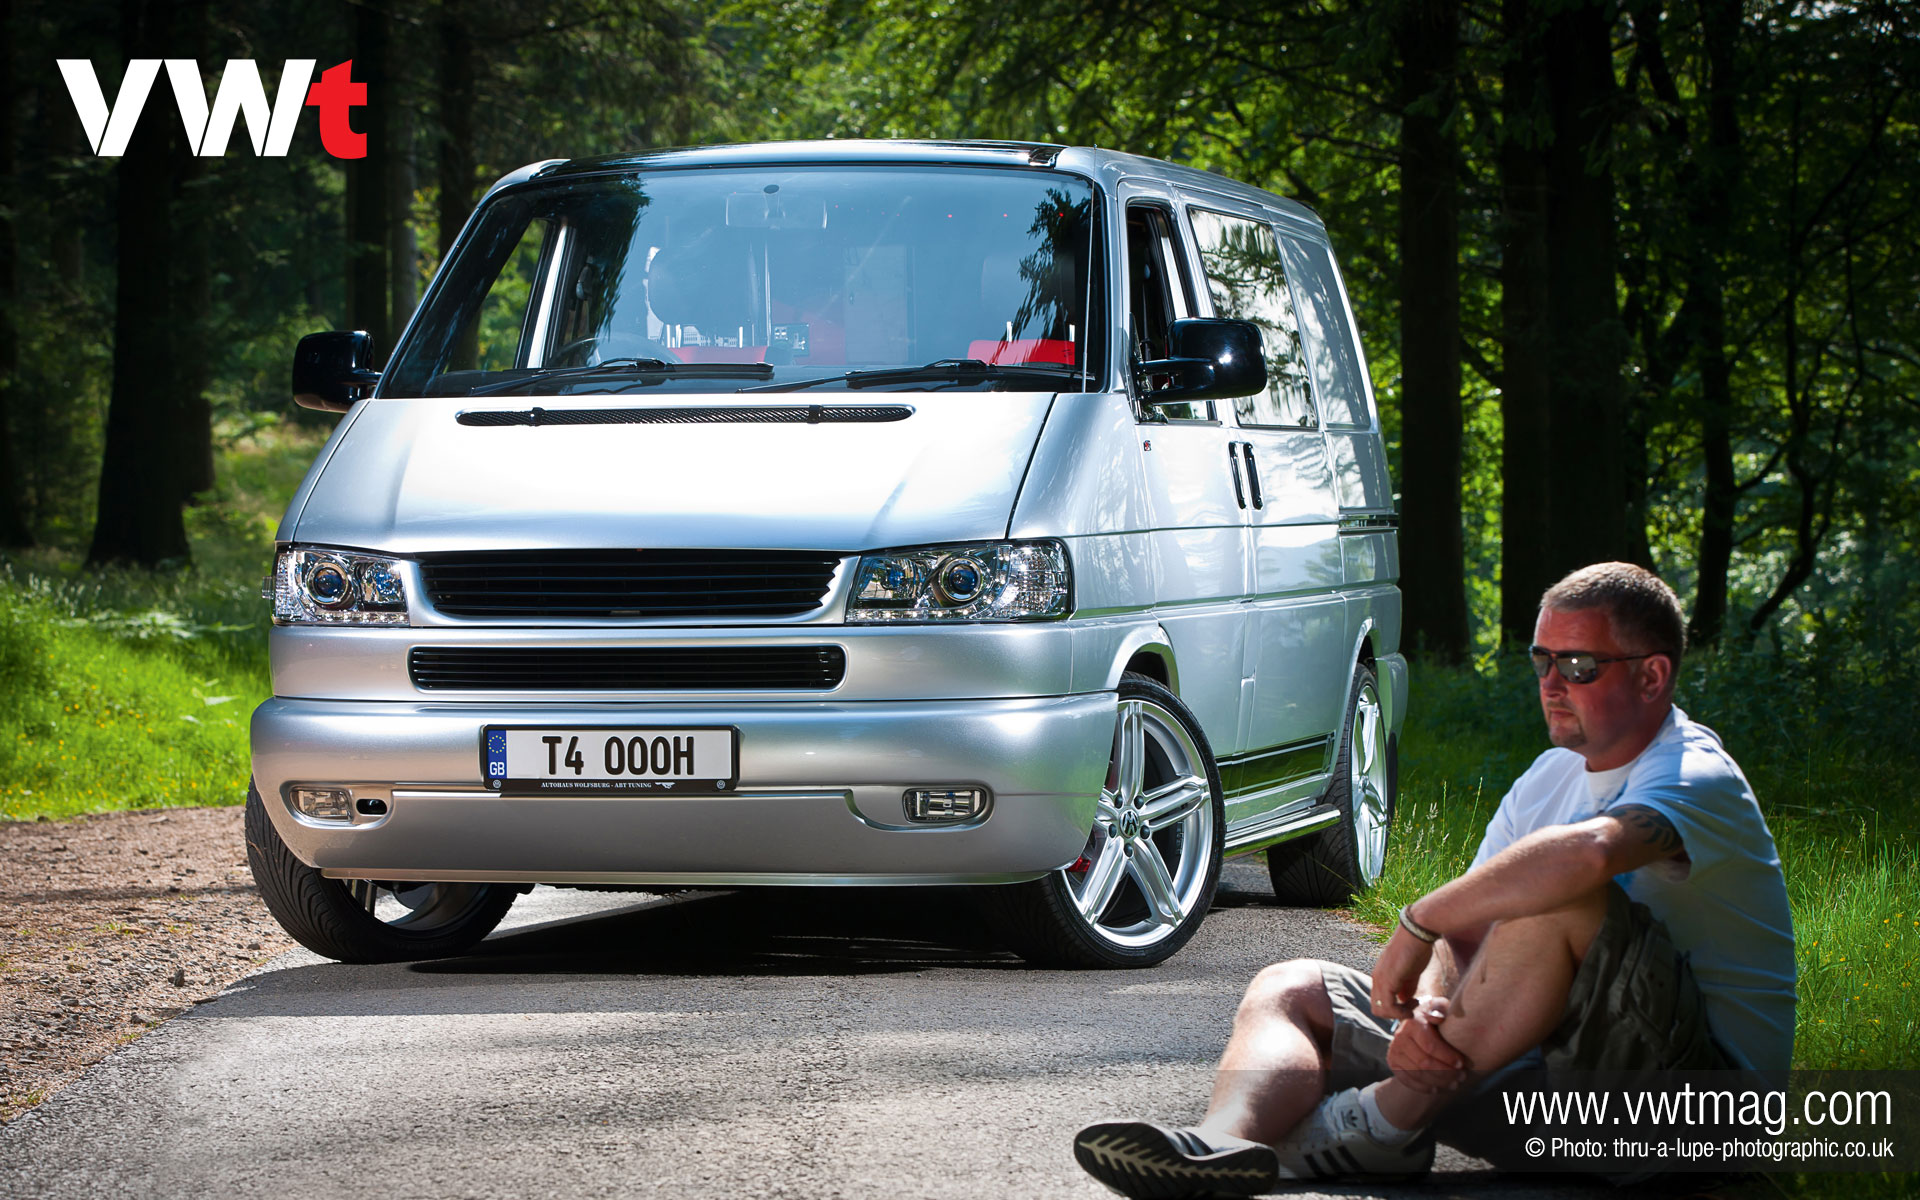 2002 Vw T4 Campervan Desktop Wallpaper Vwt